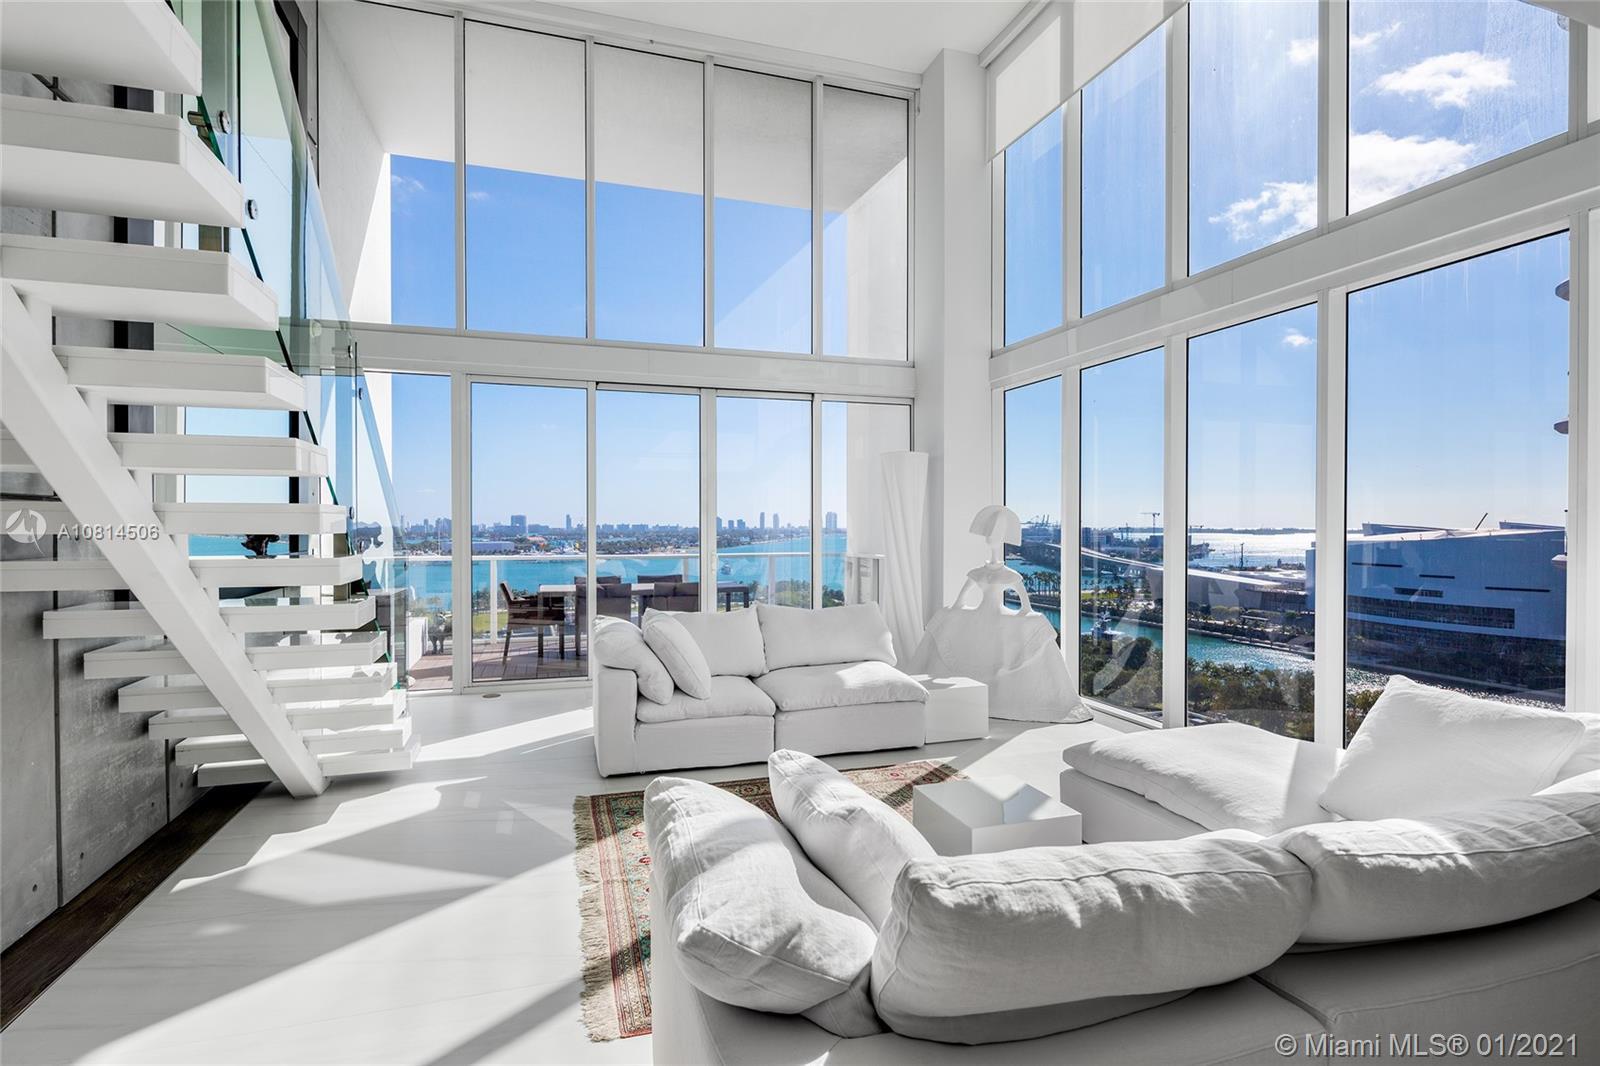 1040 Biscayne Blvd # 1201, Miami, Florida 33132, 2 Bedrooms Bedrooms, ,3 BathroomsBathrooms,Residential,For Sale,1040 Biscayne Blvd # 1201,A10814506